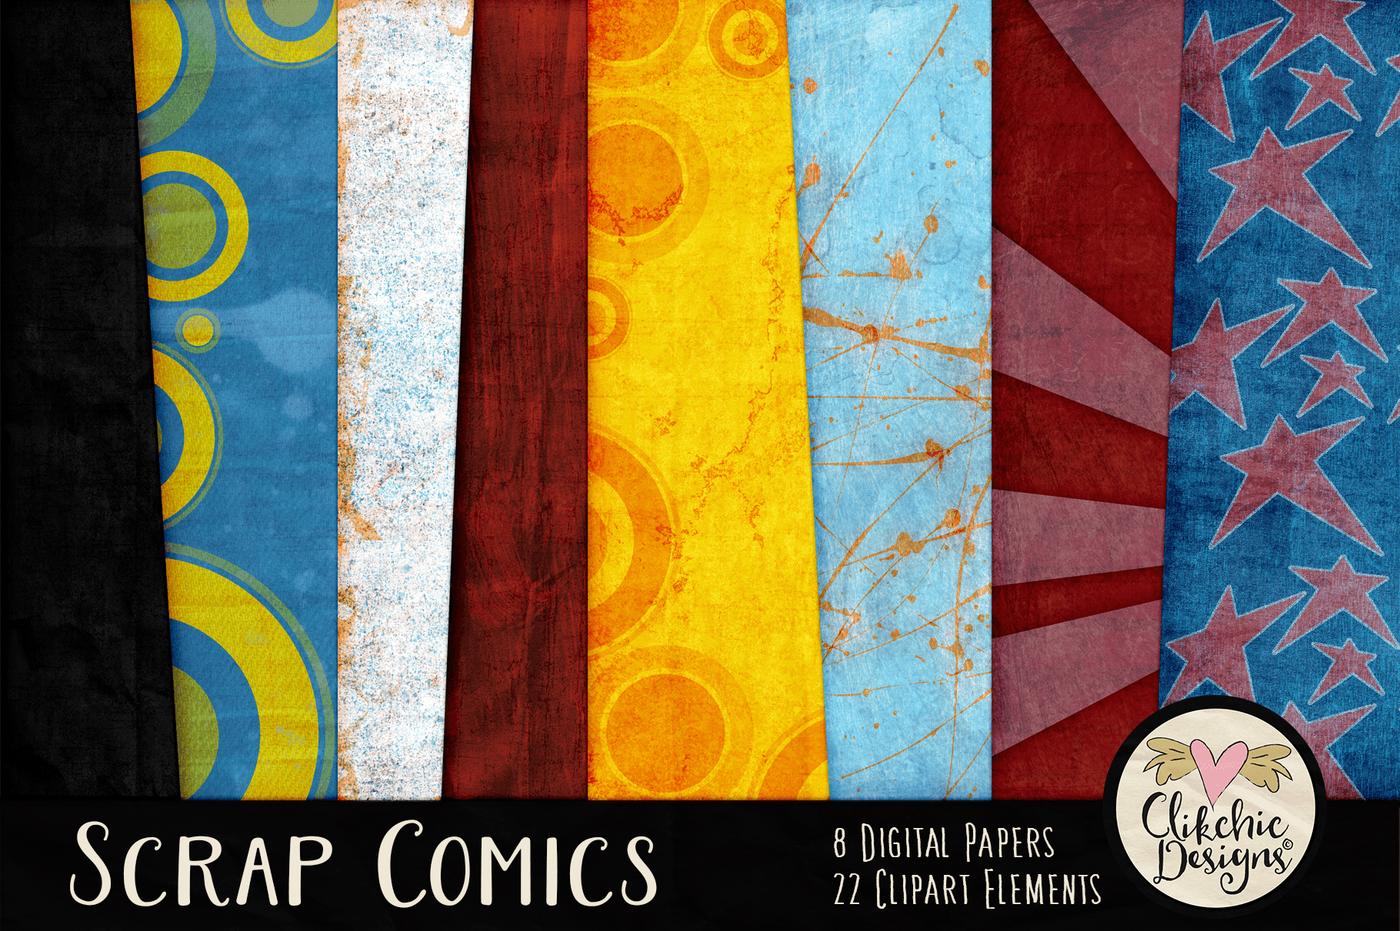 Scrap Comics Digital Scrapbook Kit By Clikchic Designs